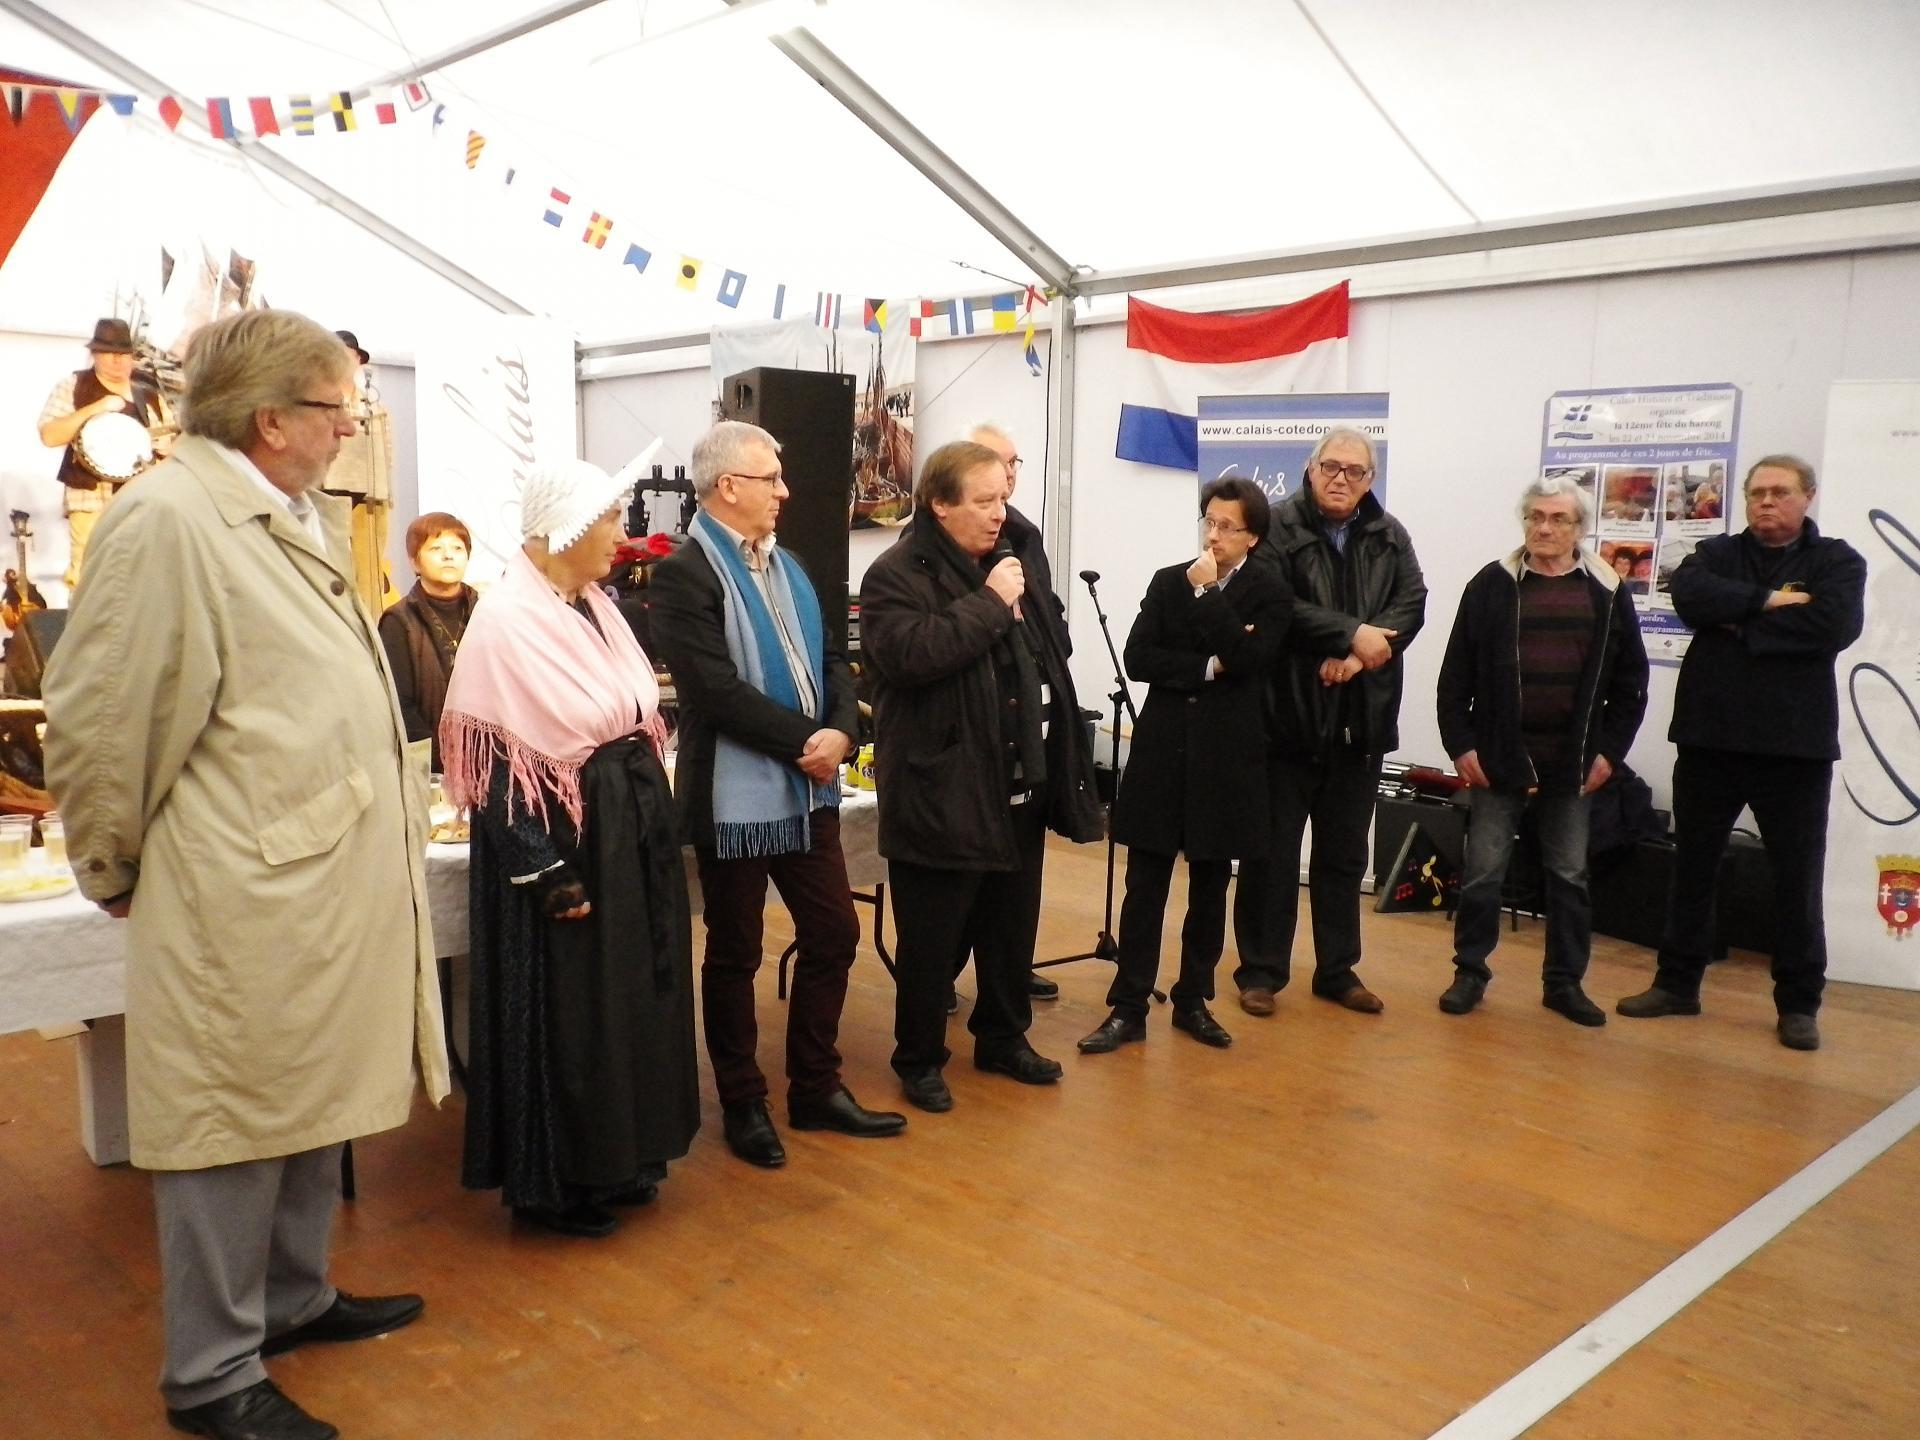 Inauguration fete du hareng calais 2014